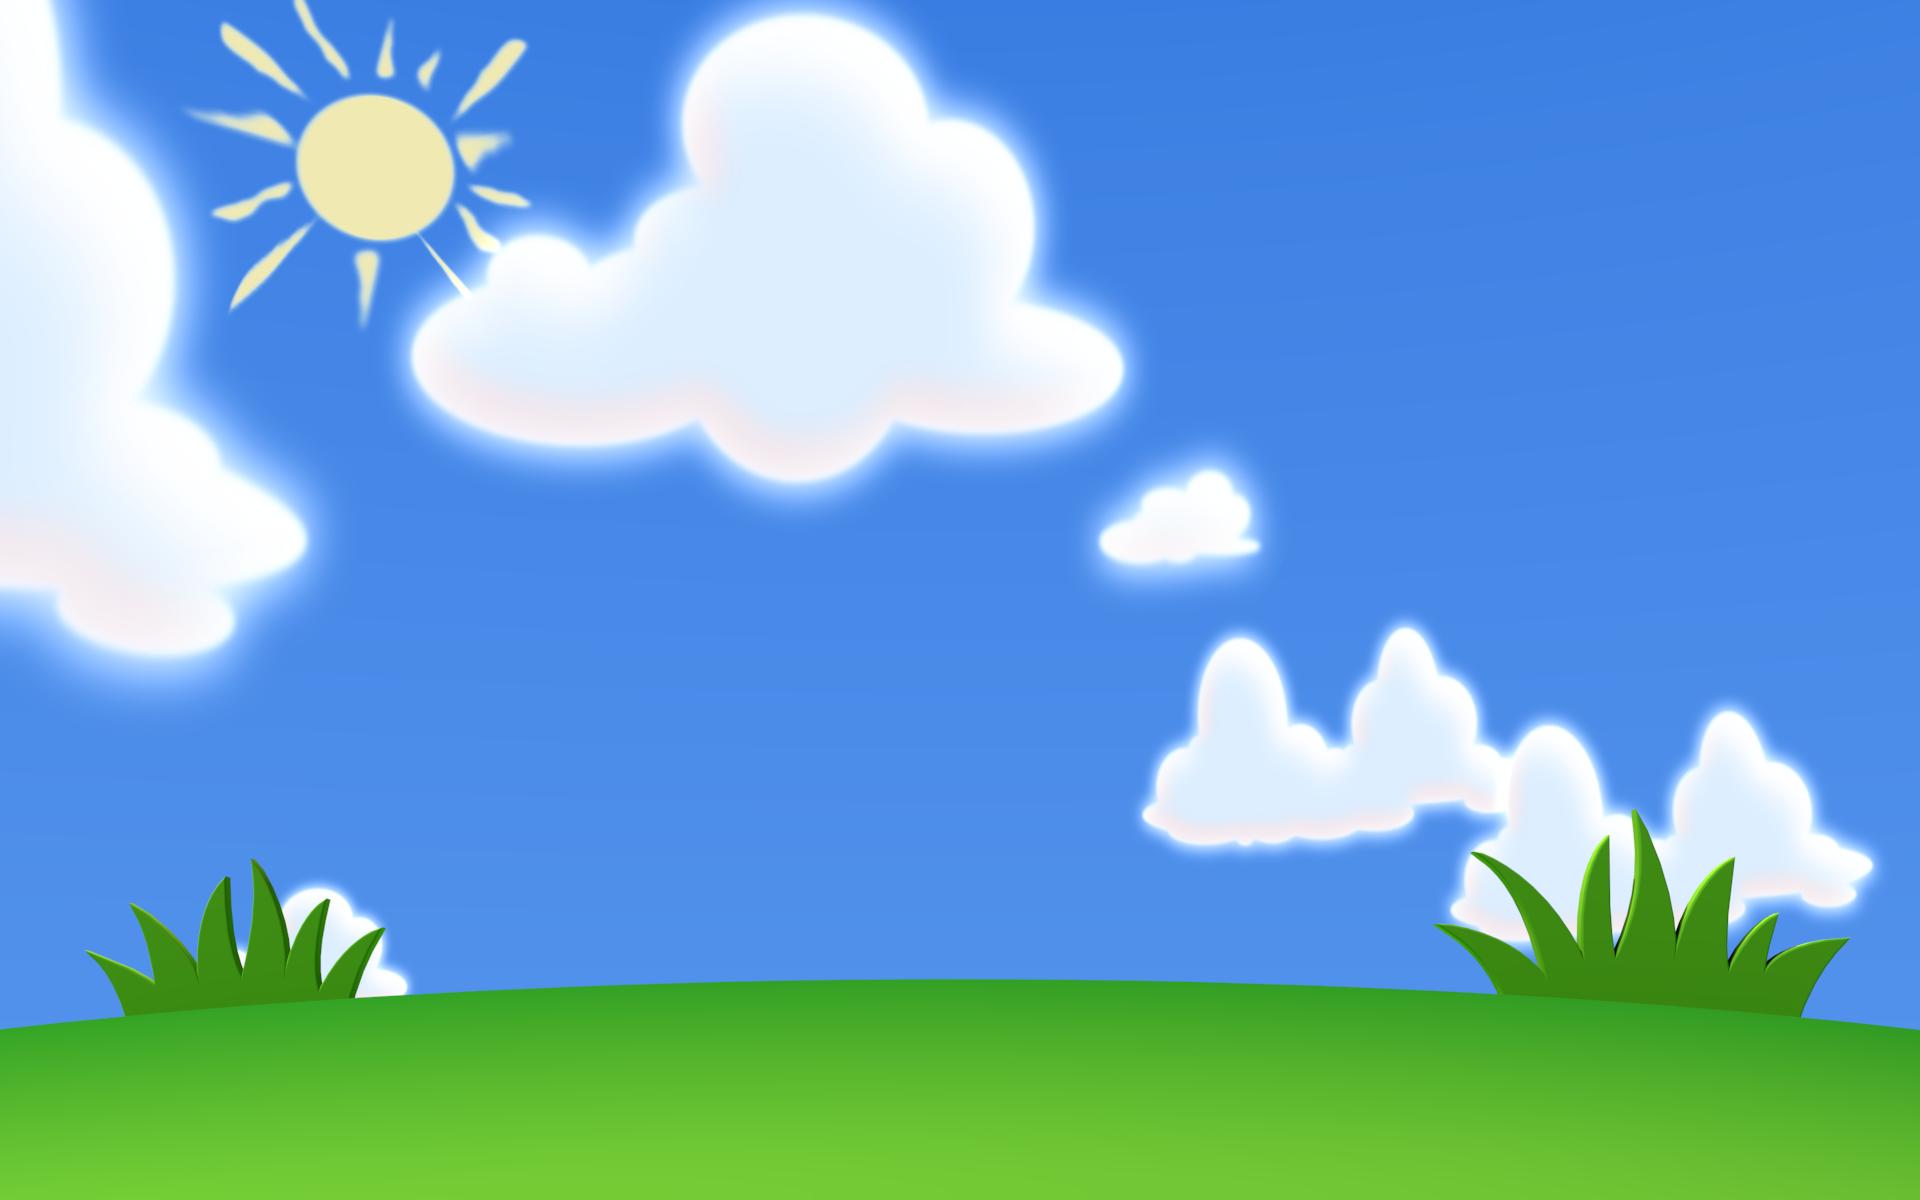 cloud clipart background - photo #23